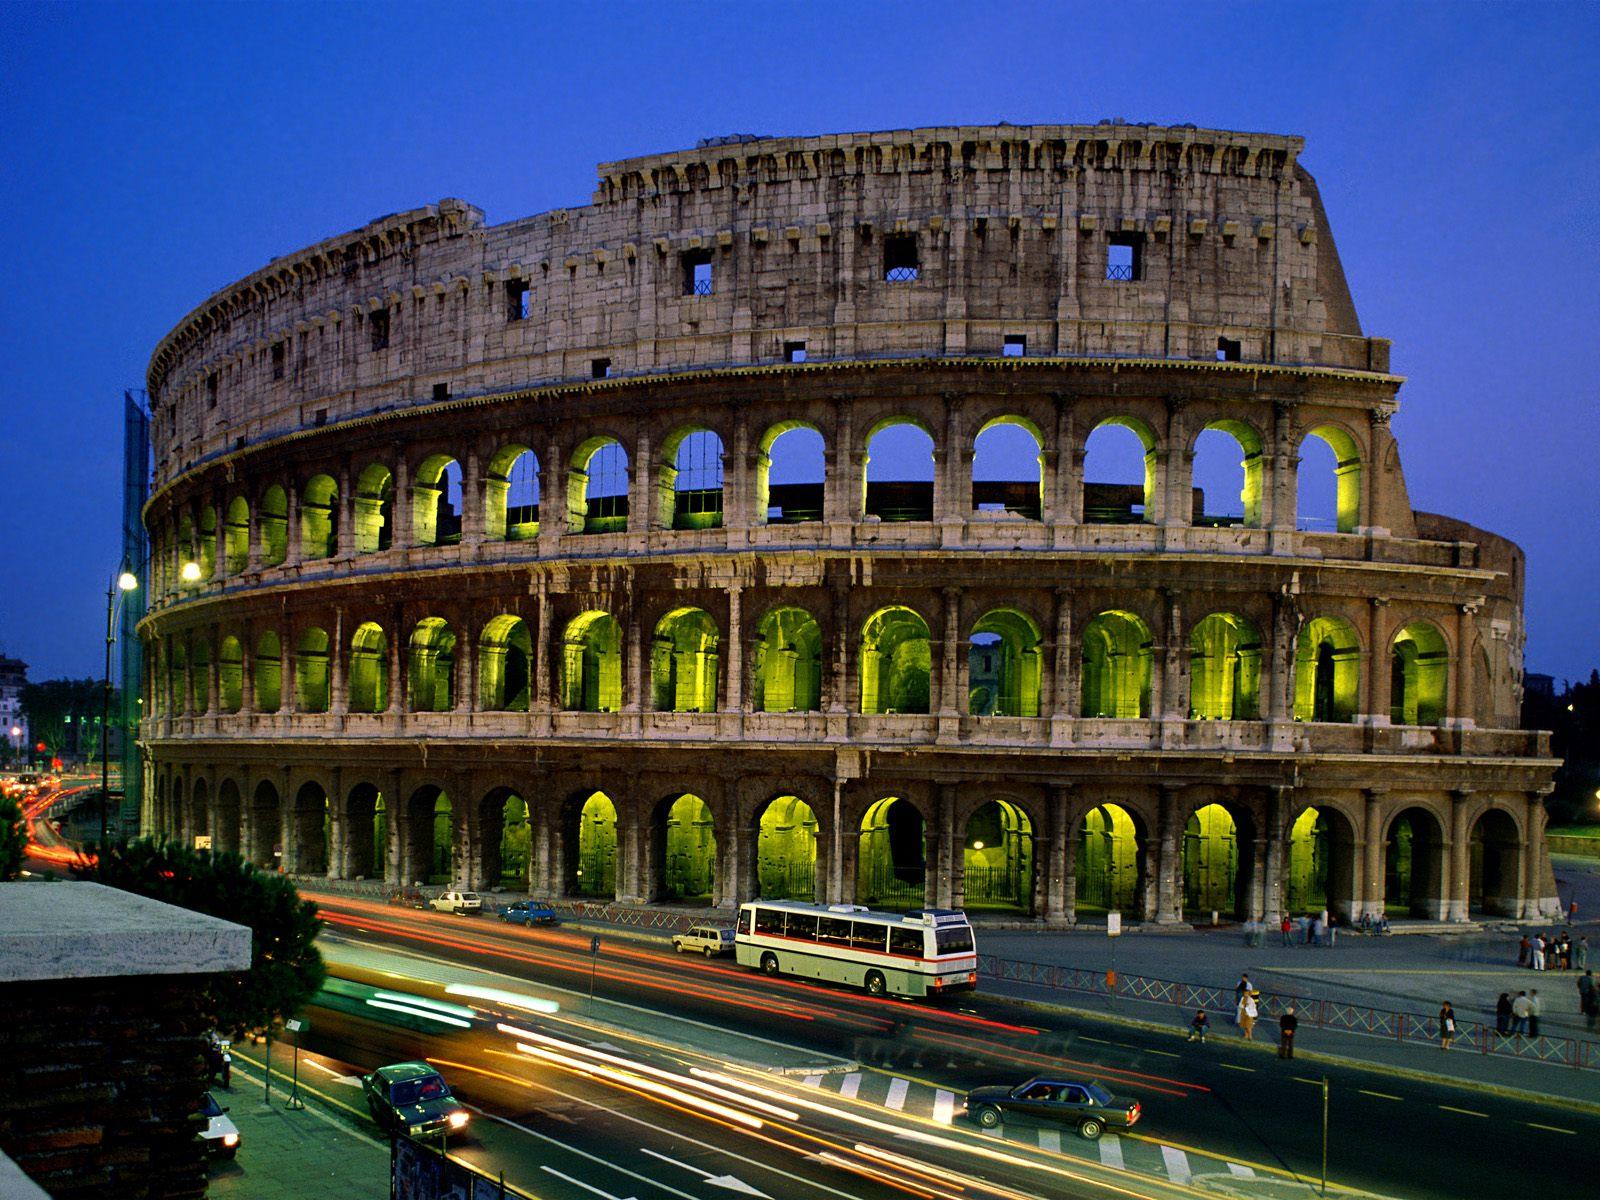 http://1.bp.blogspot.com/-g5PFEt8SwVs/TwKay3rzckI/AAAAAAAAA7A/vGB09AngHPs/s1600/Italy-Beauty+of+the+World-Wallpaper-Coliseum%252C+Rome%252C+Italy.jpg